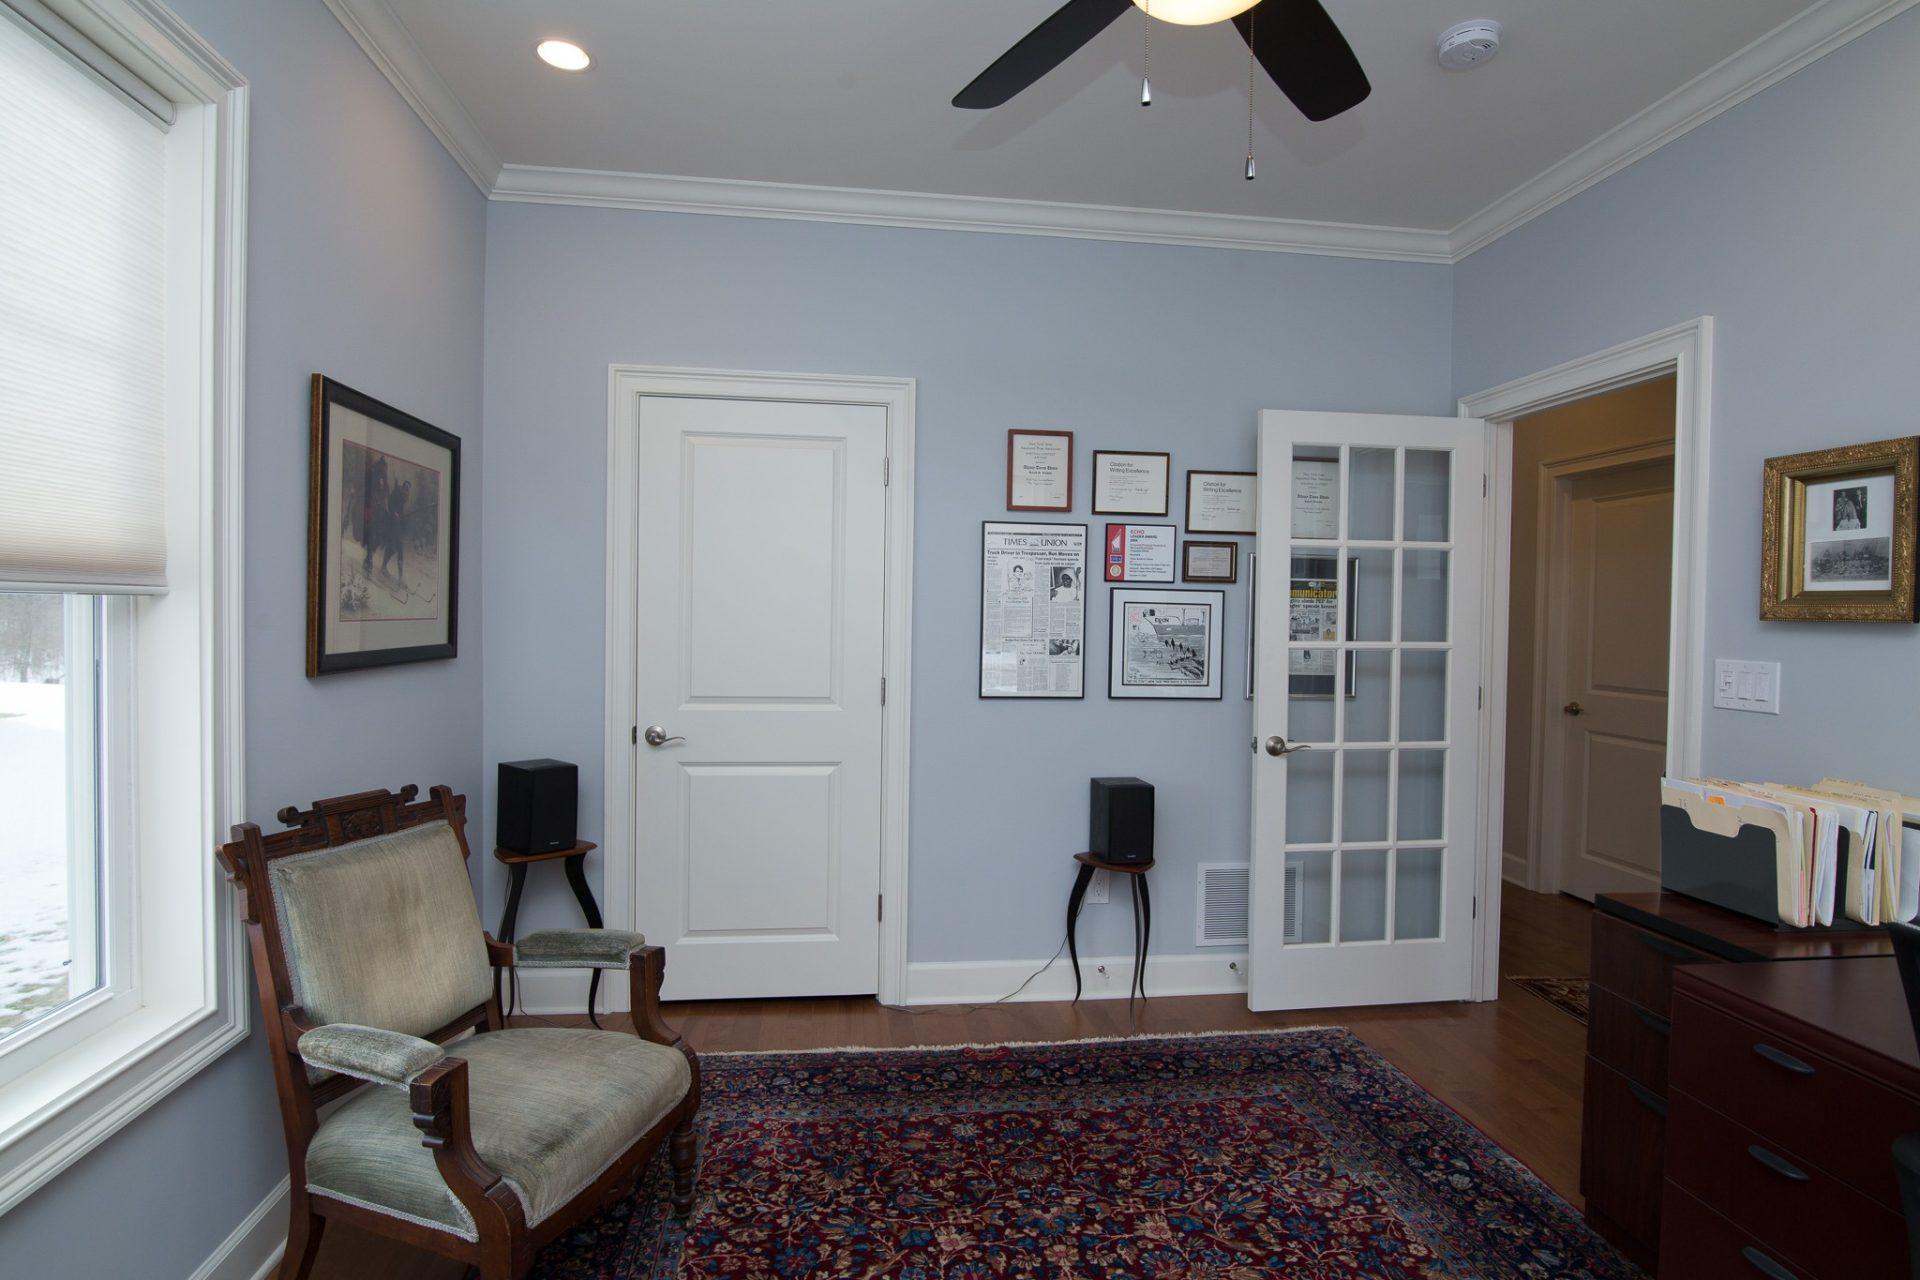 Saratoga Springs image 17